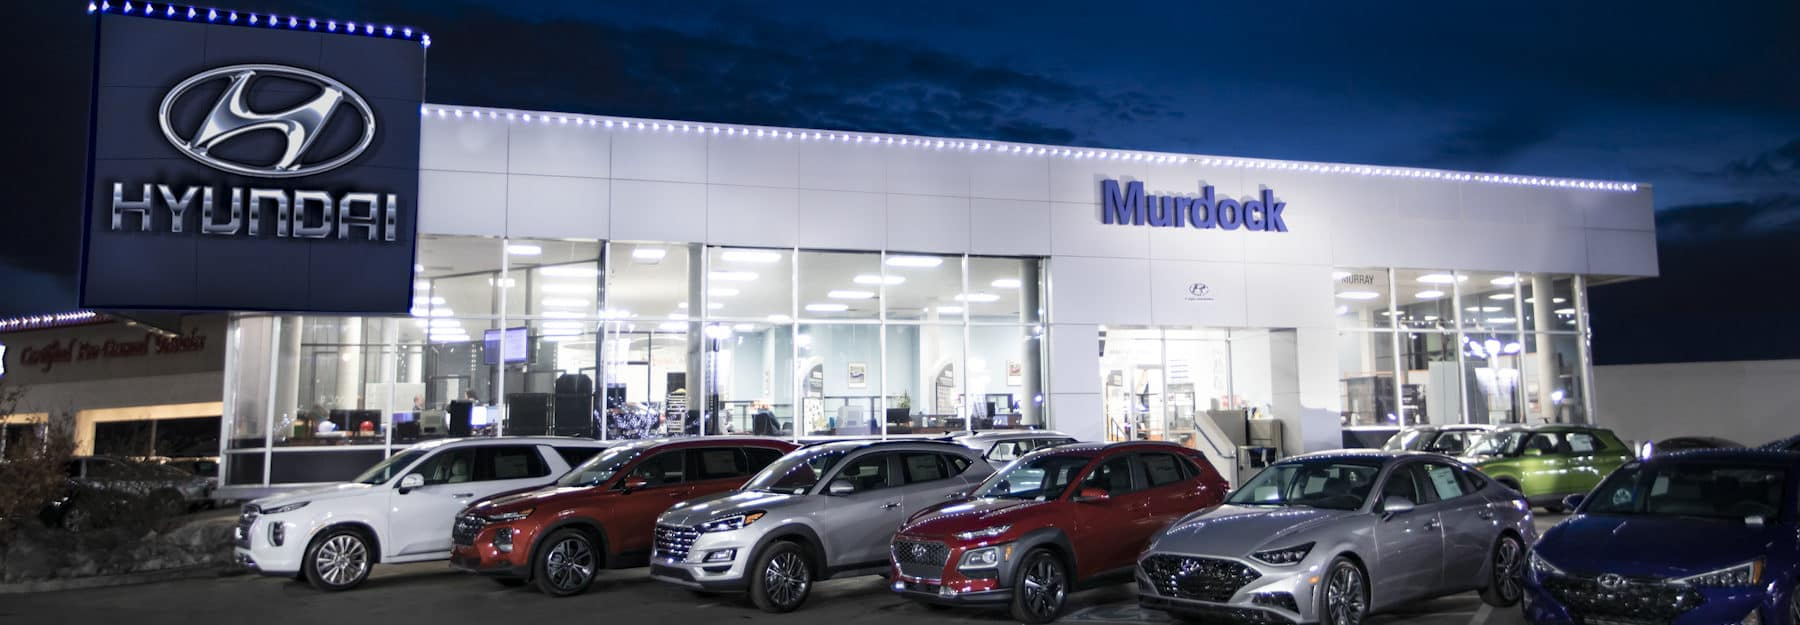 Murdock Hyundai